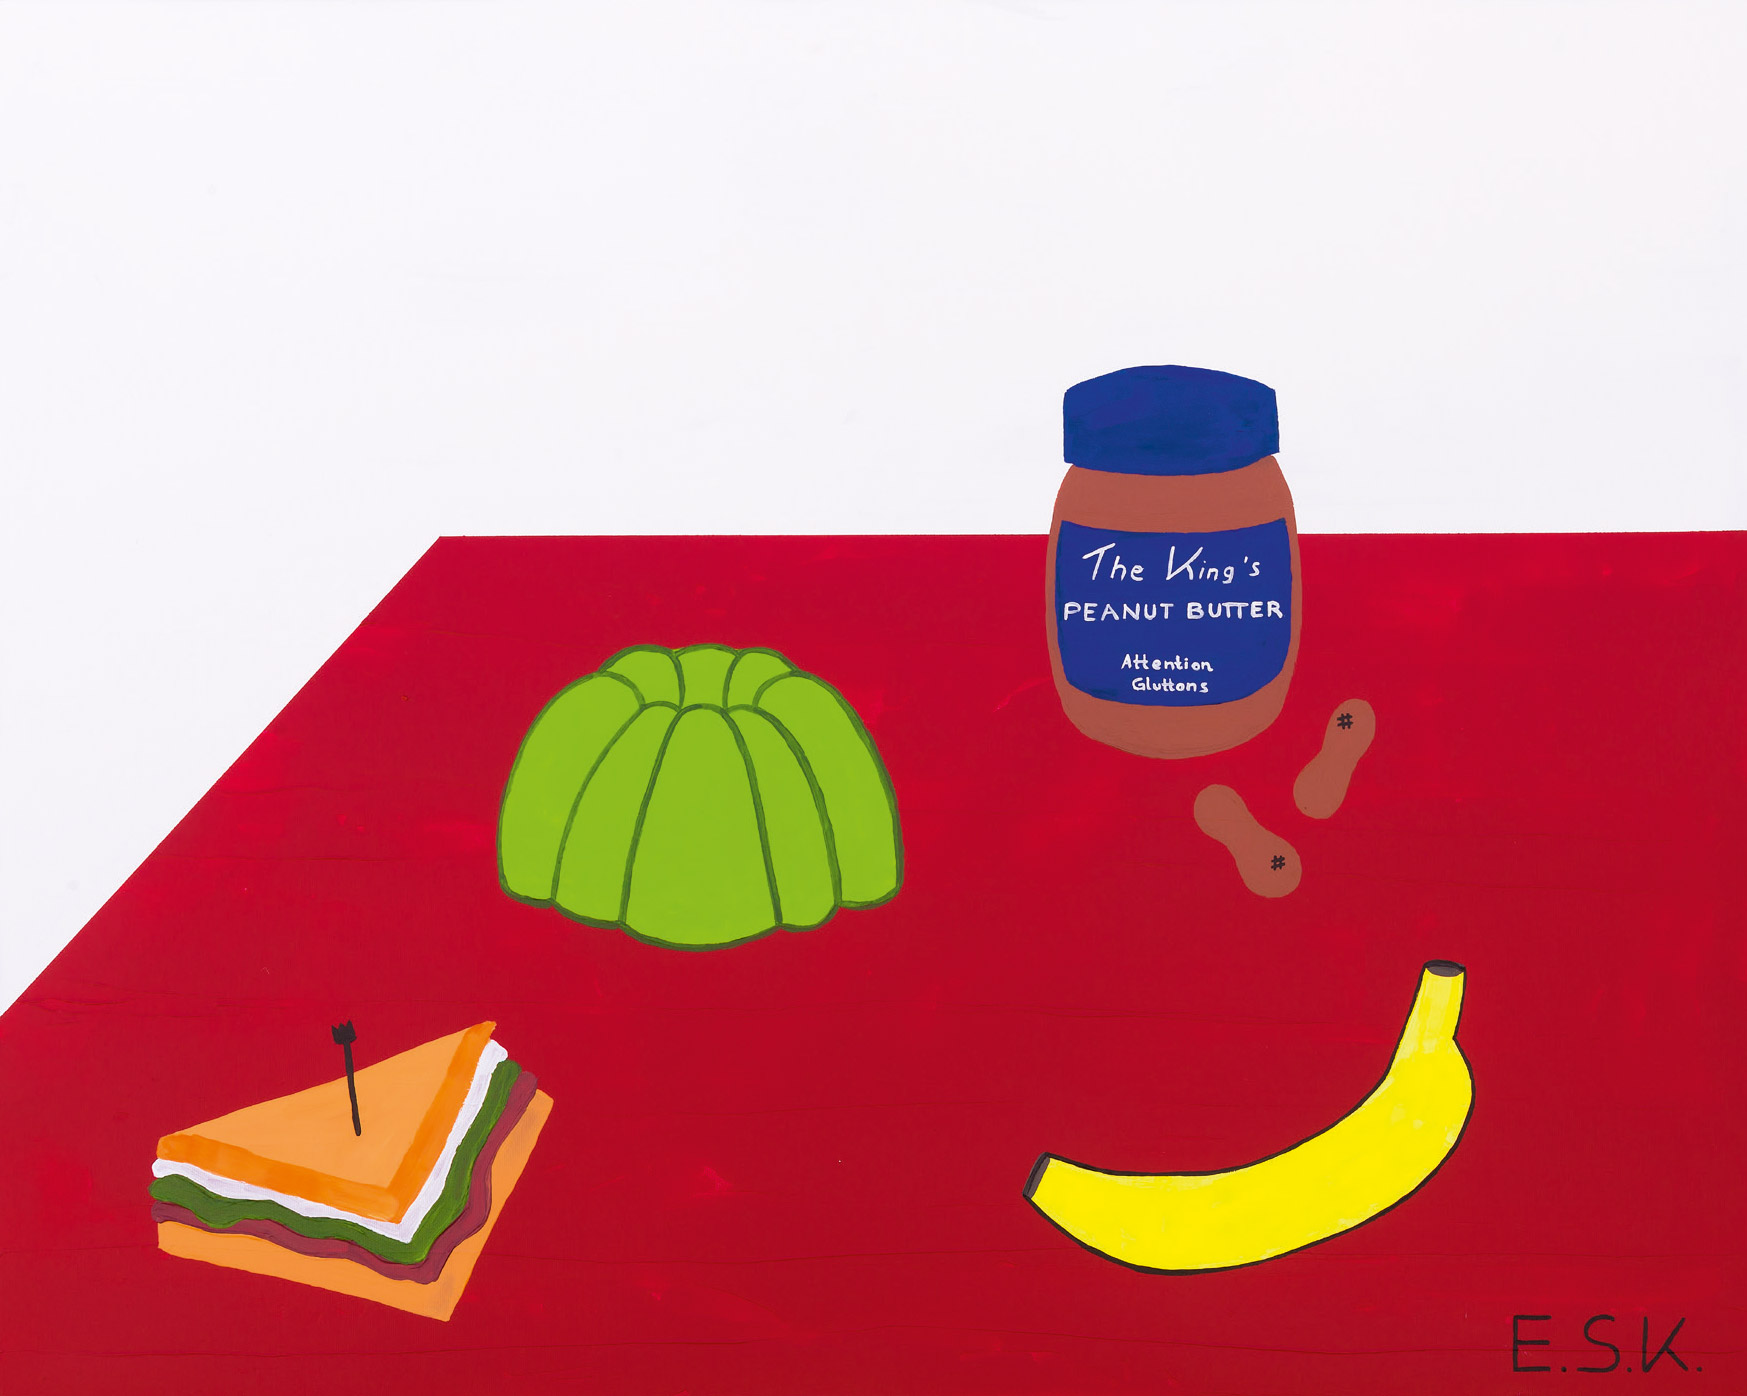 Gluttony Pop Art by E.S.K. Eileen Susanne Kreipl